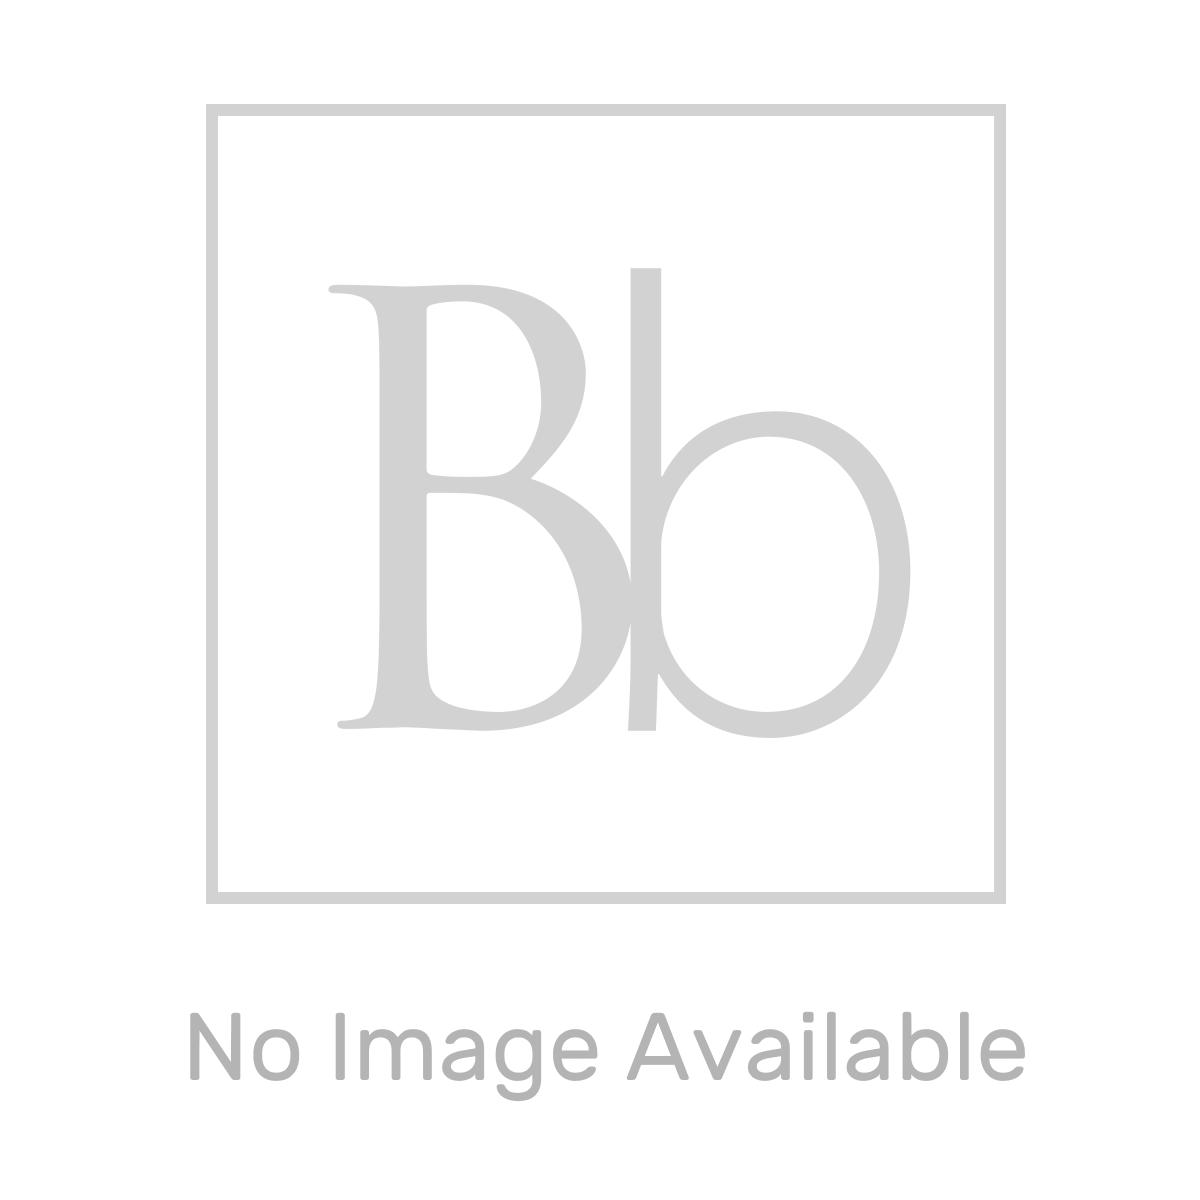 RAK Surface Matt Charcoal Black Tile 300 x 600mm